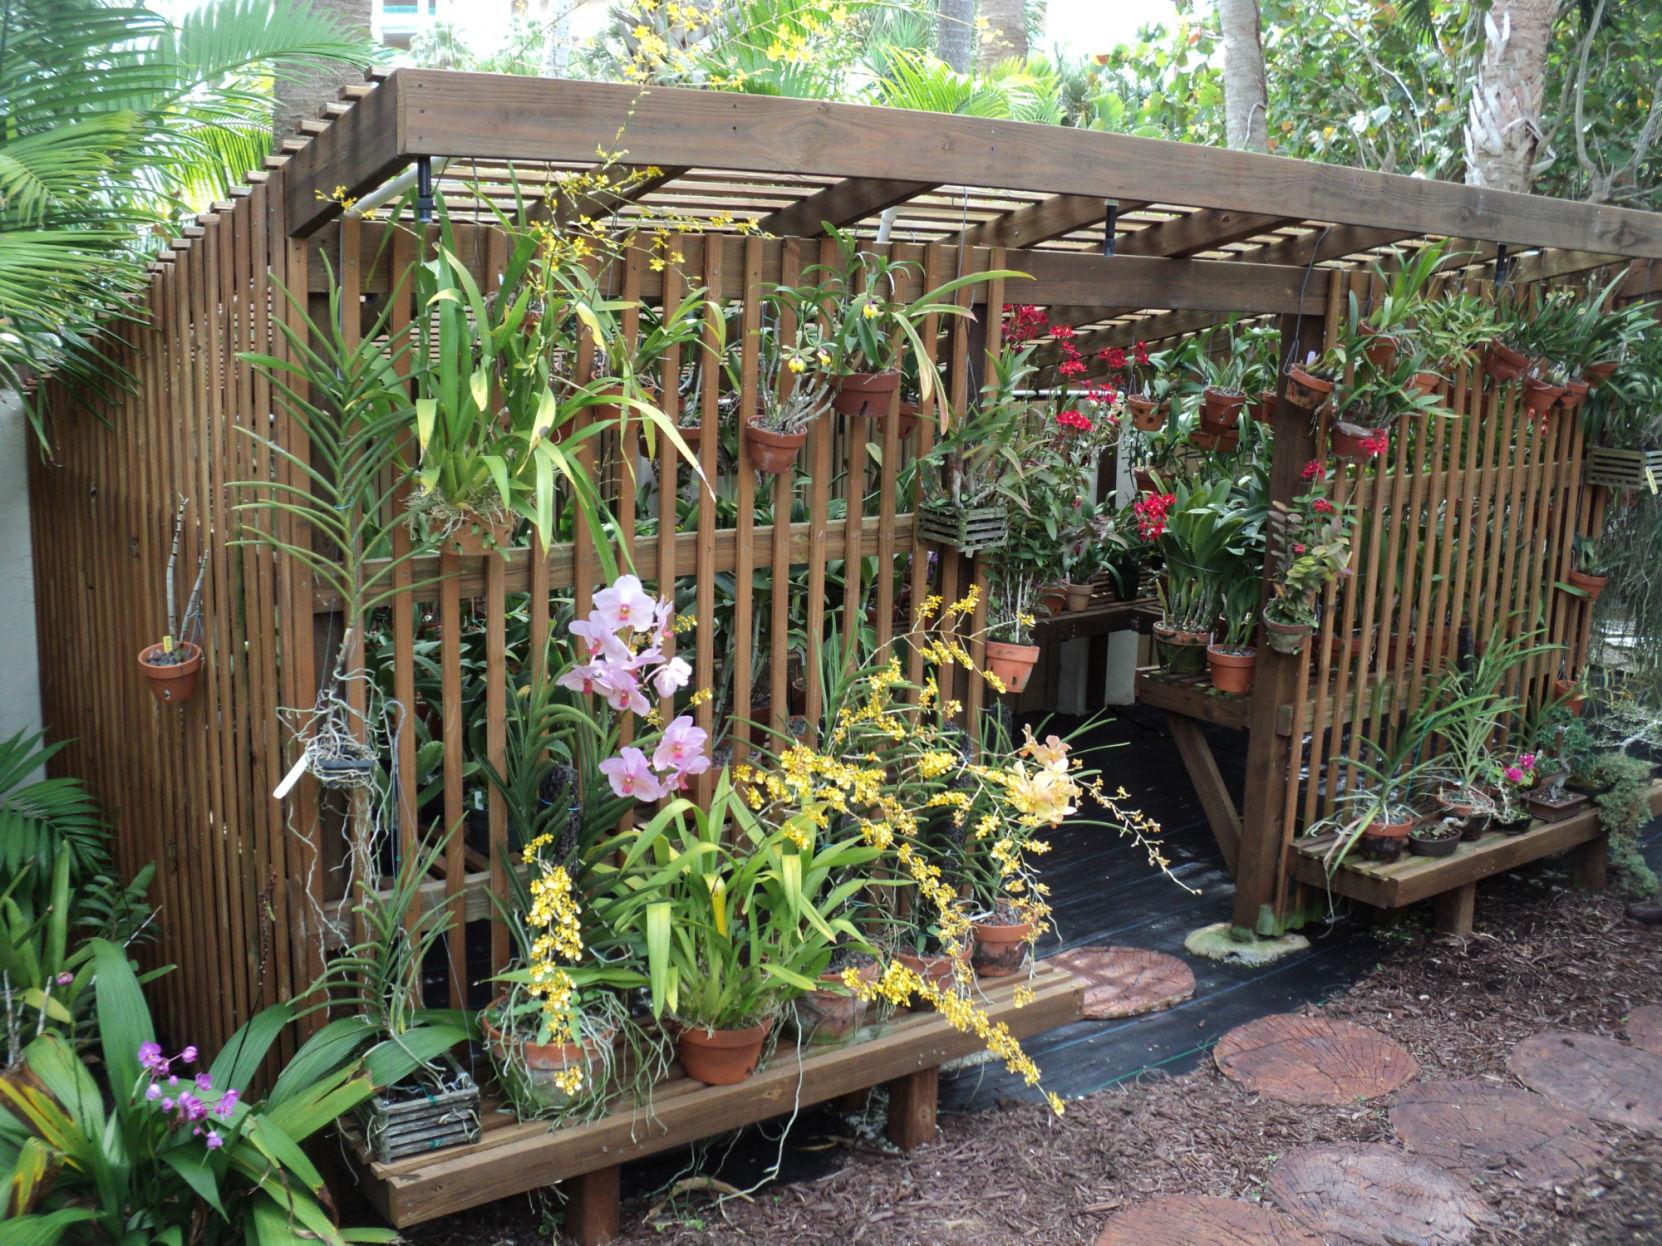 5769b0002b75f.image?resize=1200%2C900 orchid lath house designs orchid house plans and home designs,Shade House Plans